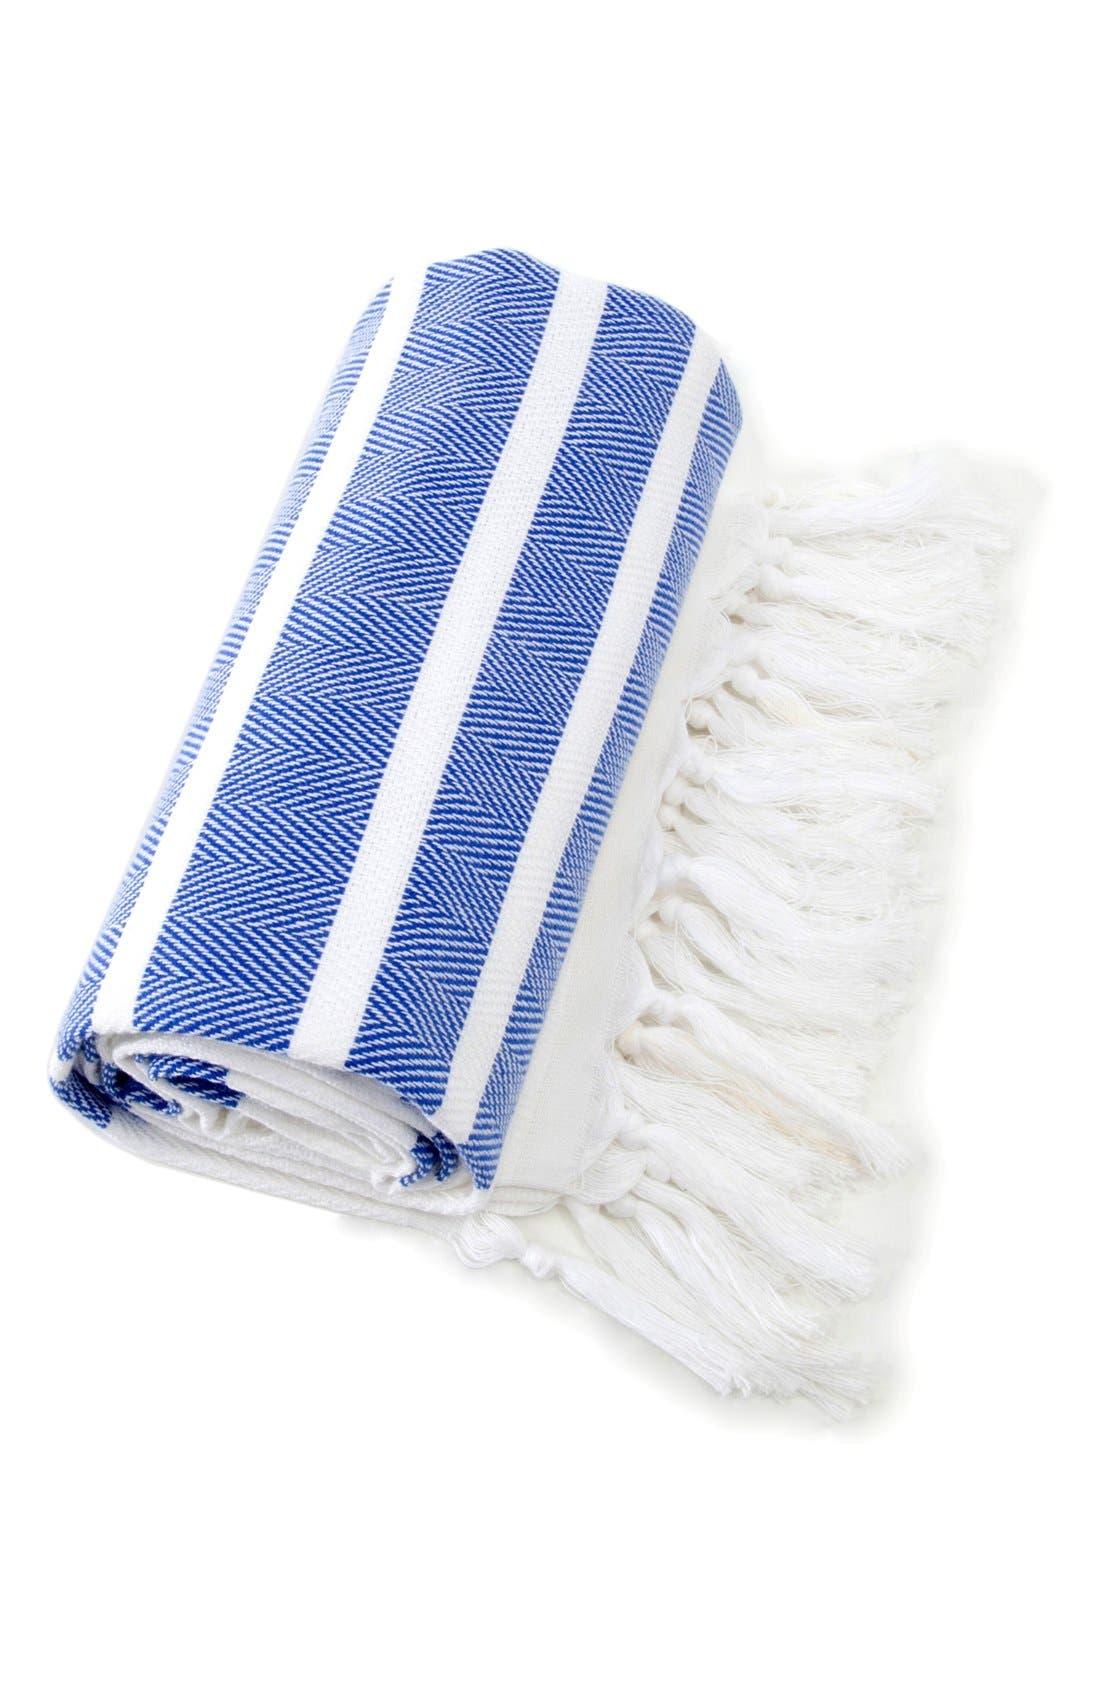 Herringbone Striped Turkish Pestemal Towel,                             Alternate thumbnail 3, color,                             Royal Blue/ White